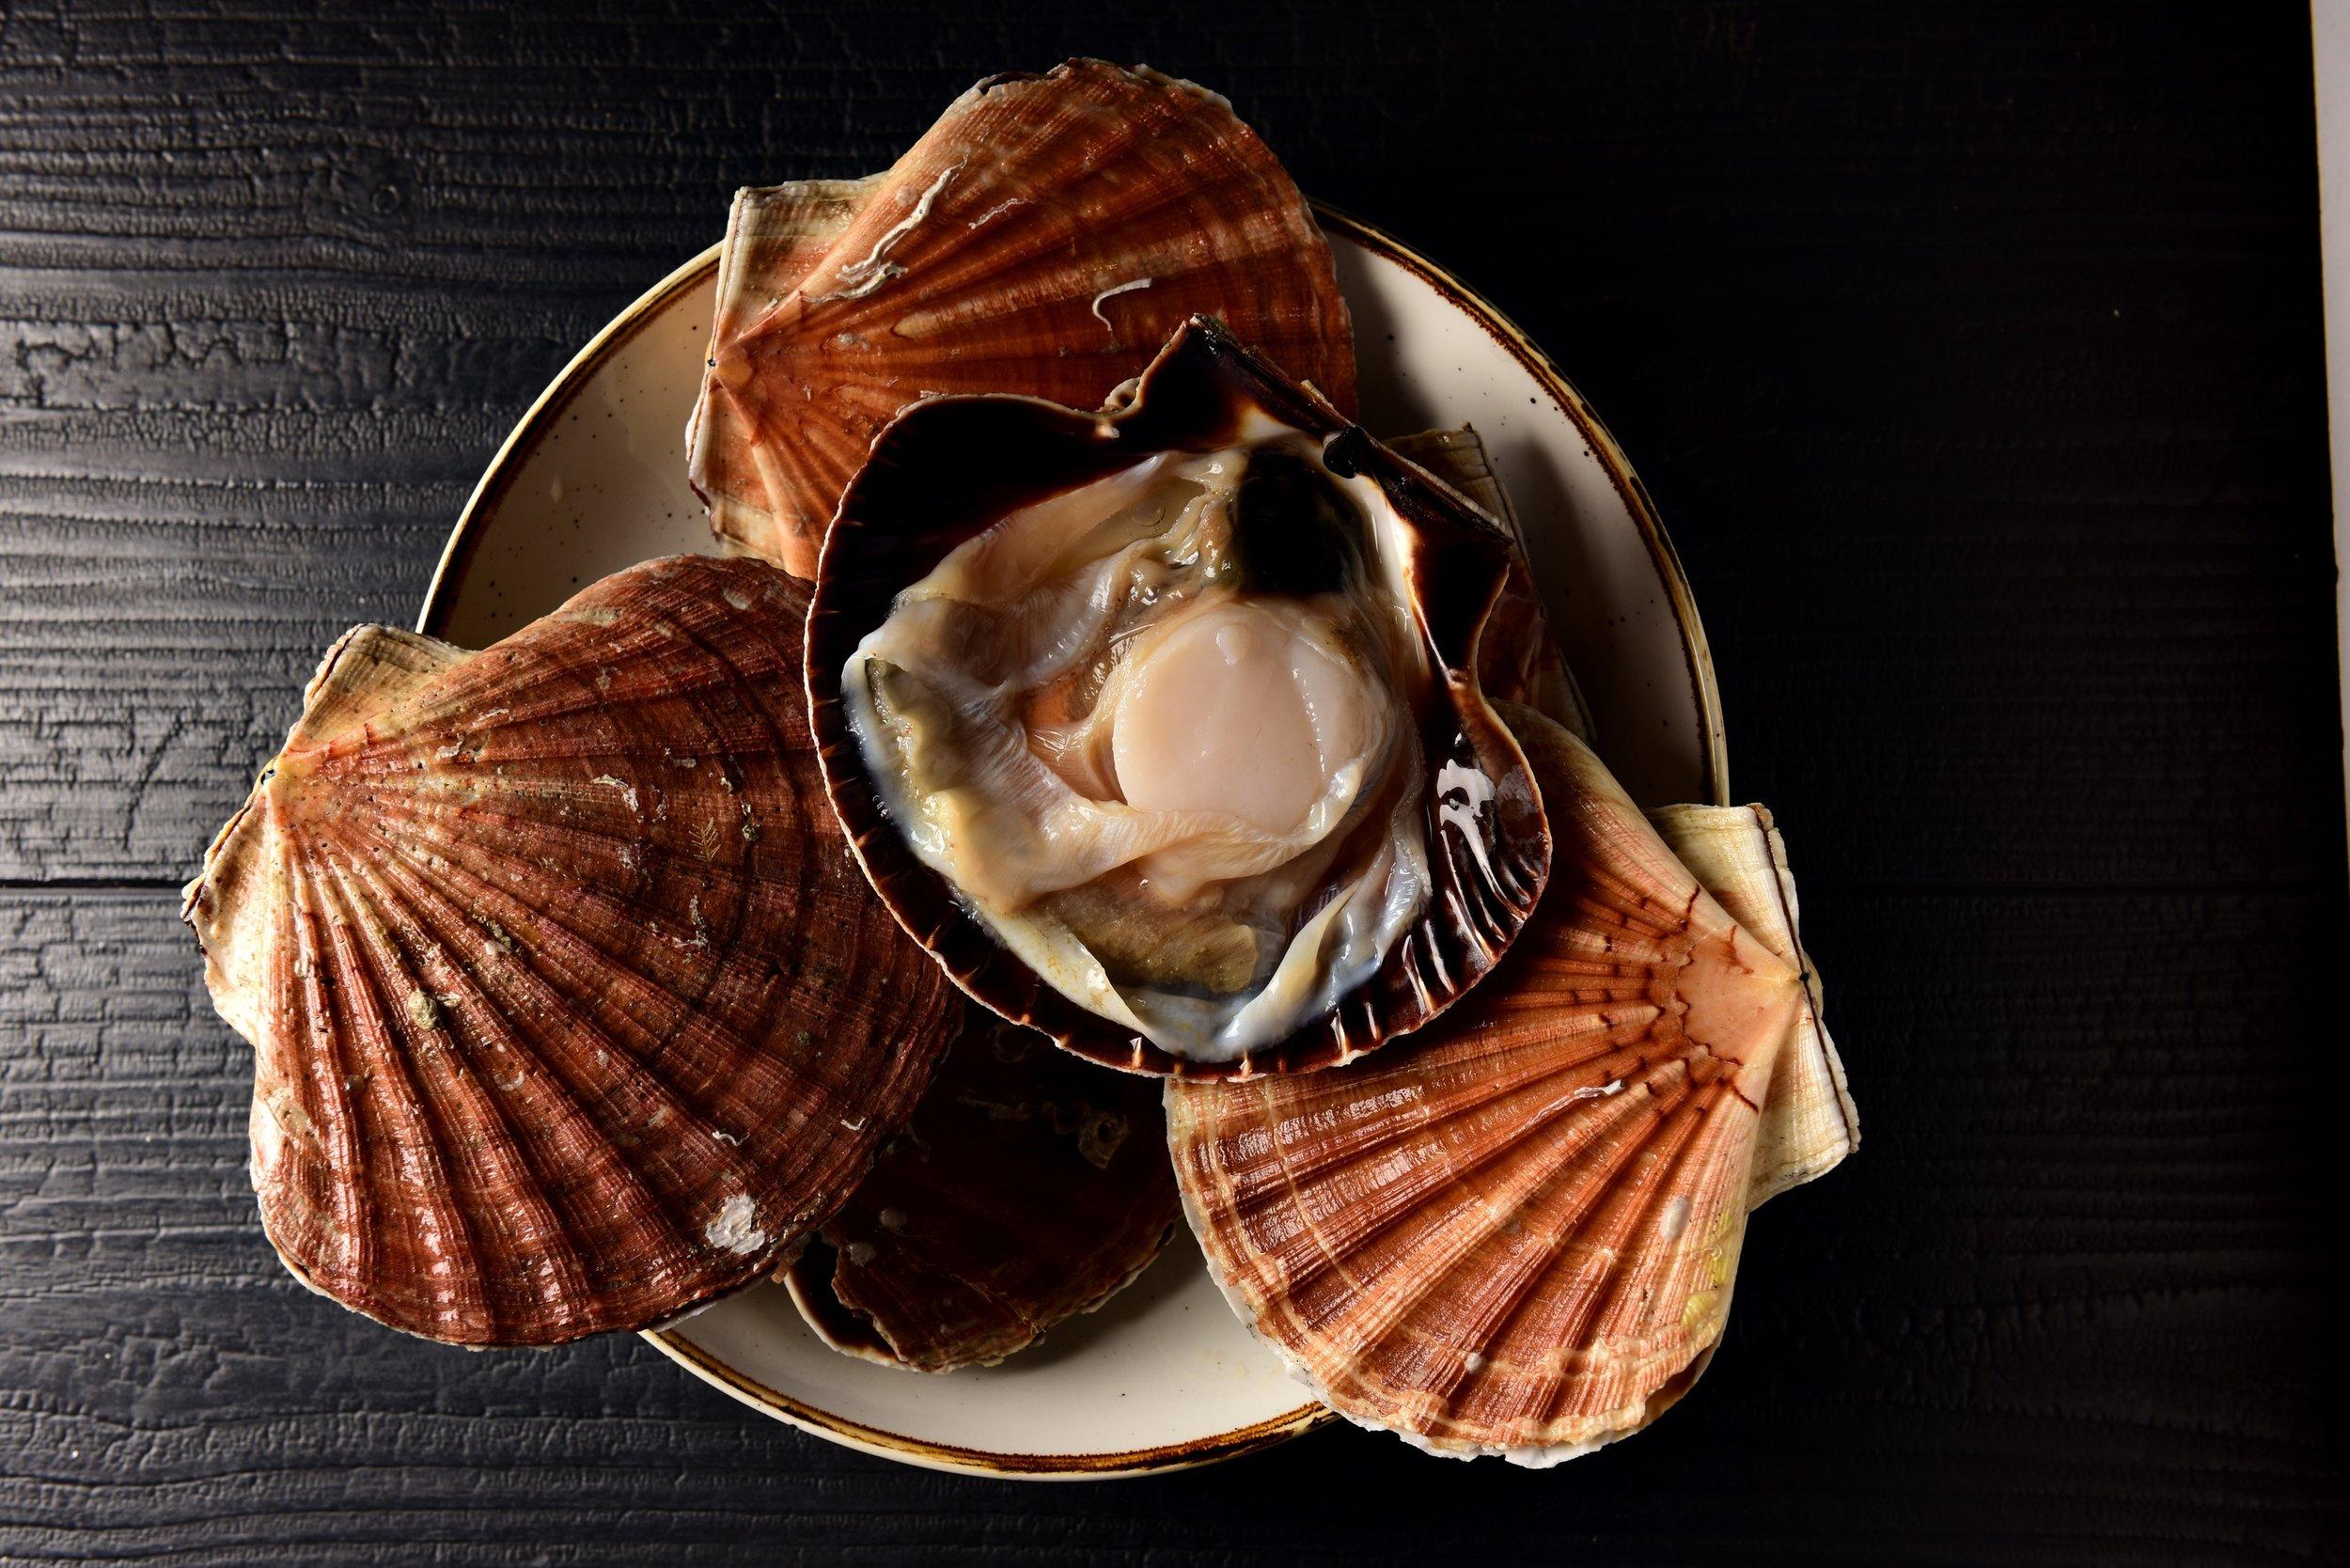 16 brasserie juste restaurant Dikkelvenne tablefever bart albrecht culinair fotograaf foodfotograaf.jpg